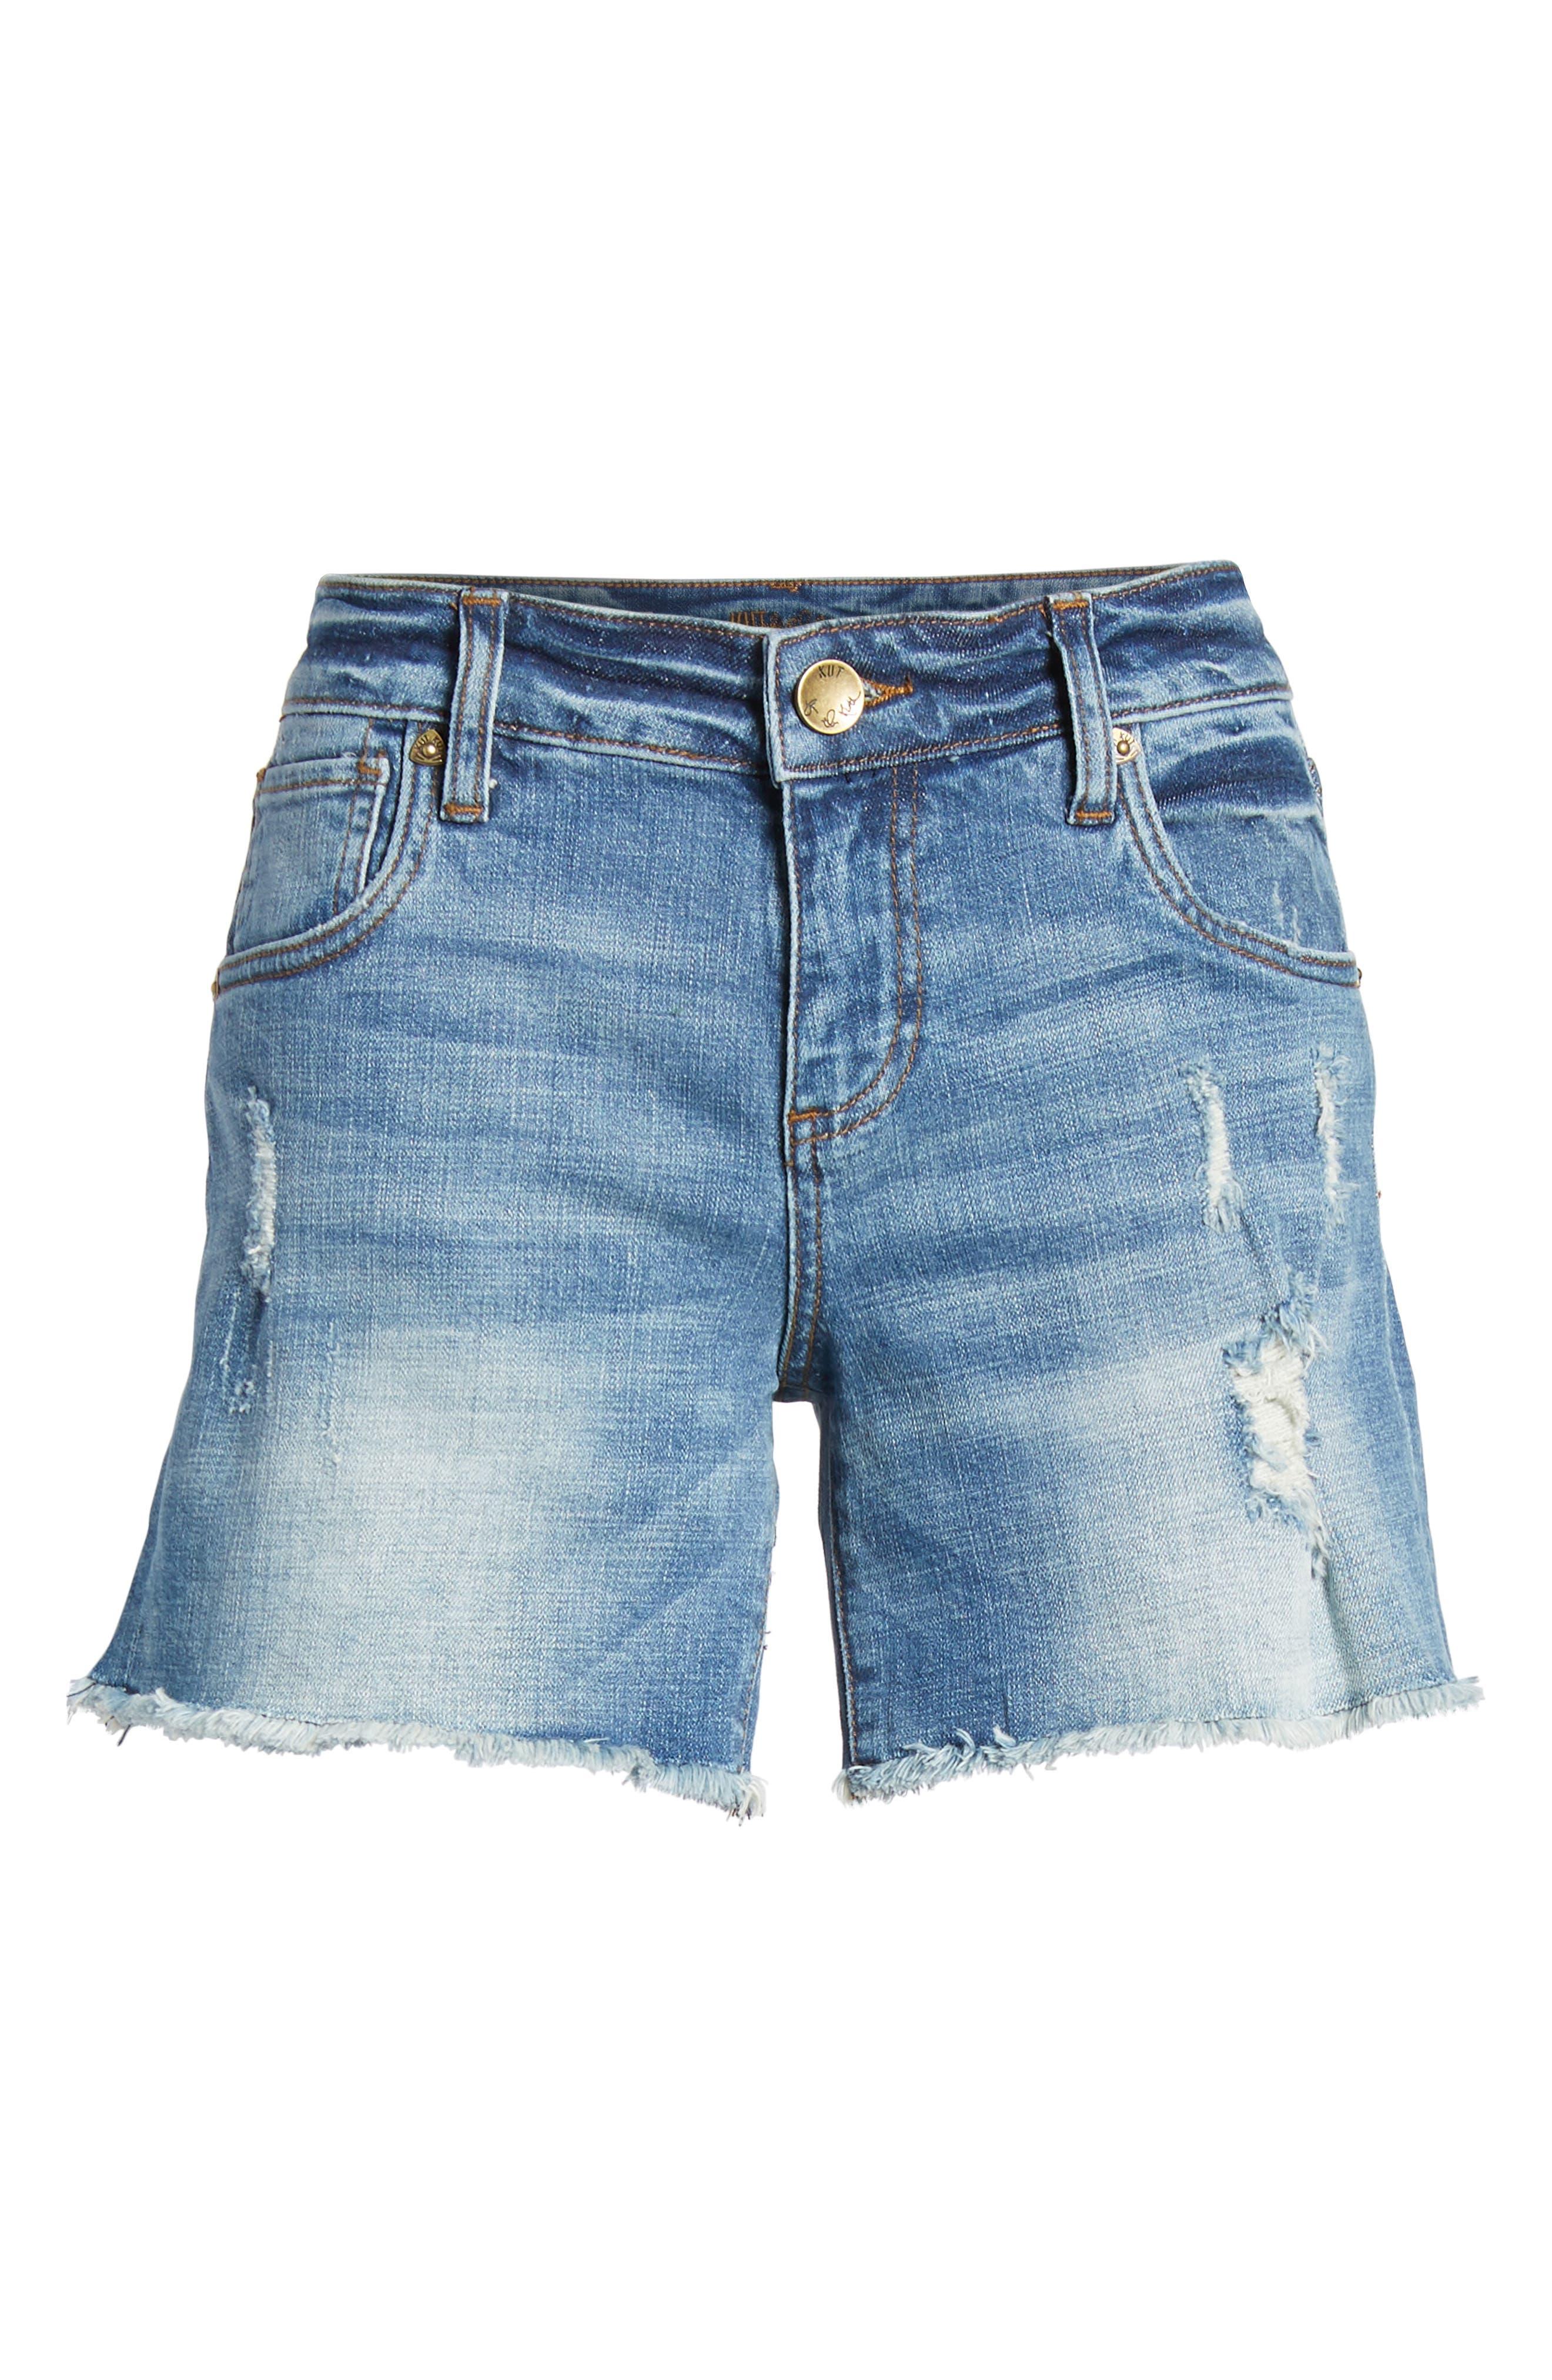 Gidget Distressed Denim Shorts,                             Alternate thumbnail 7, color,                             Constructive